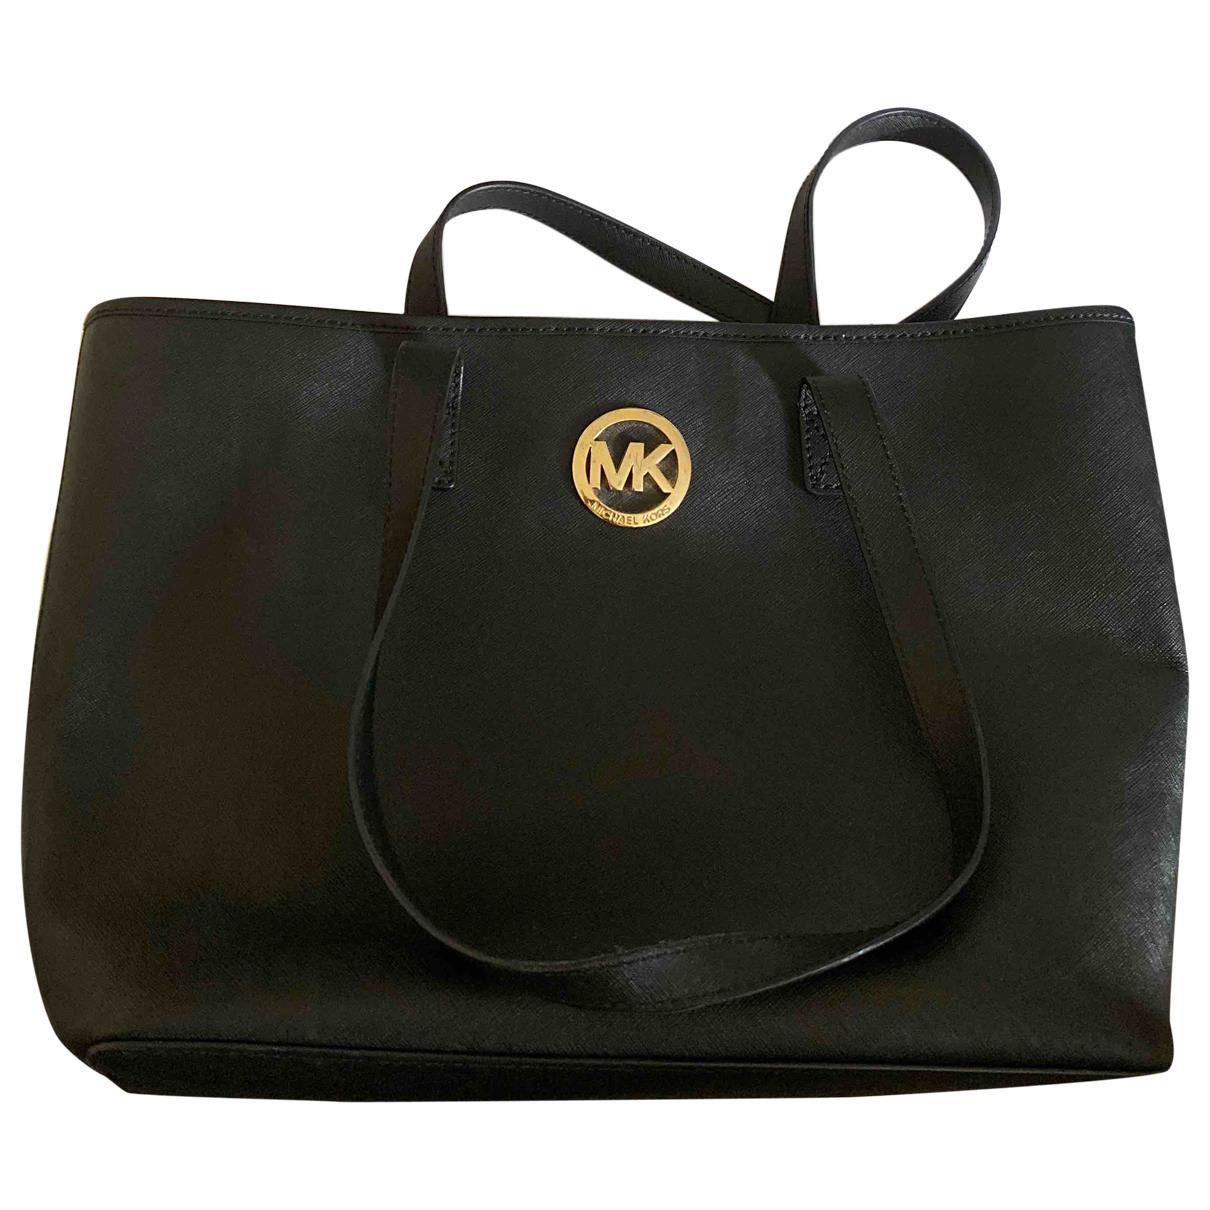 Michael Kors - Sac a main Mercer pour femme - noir